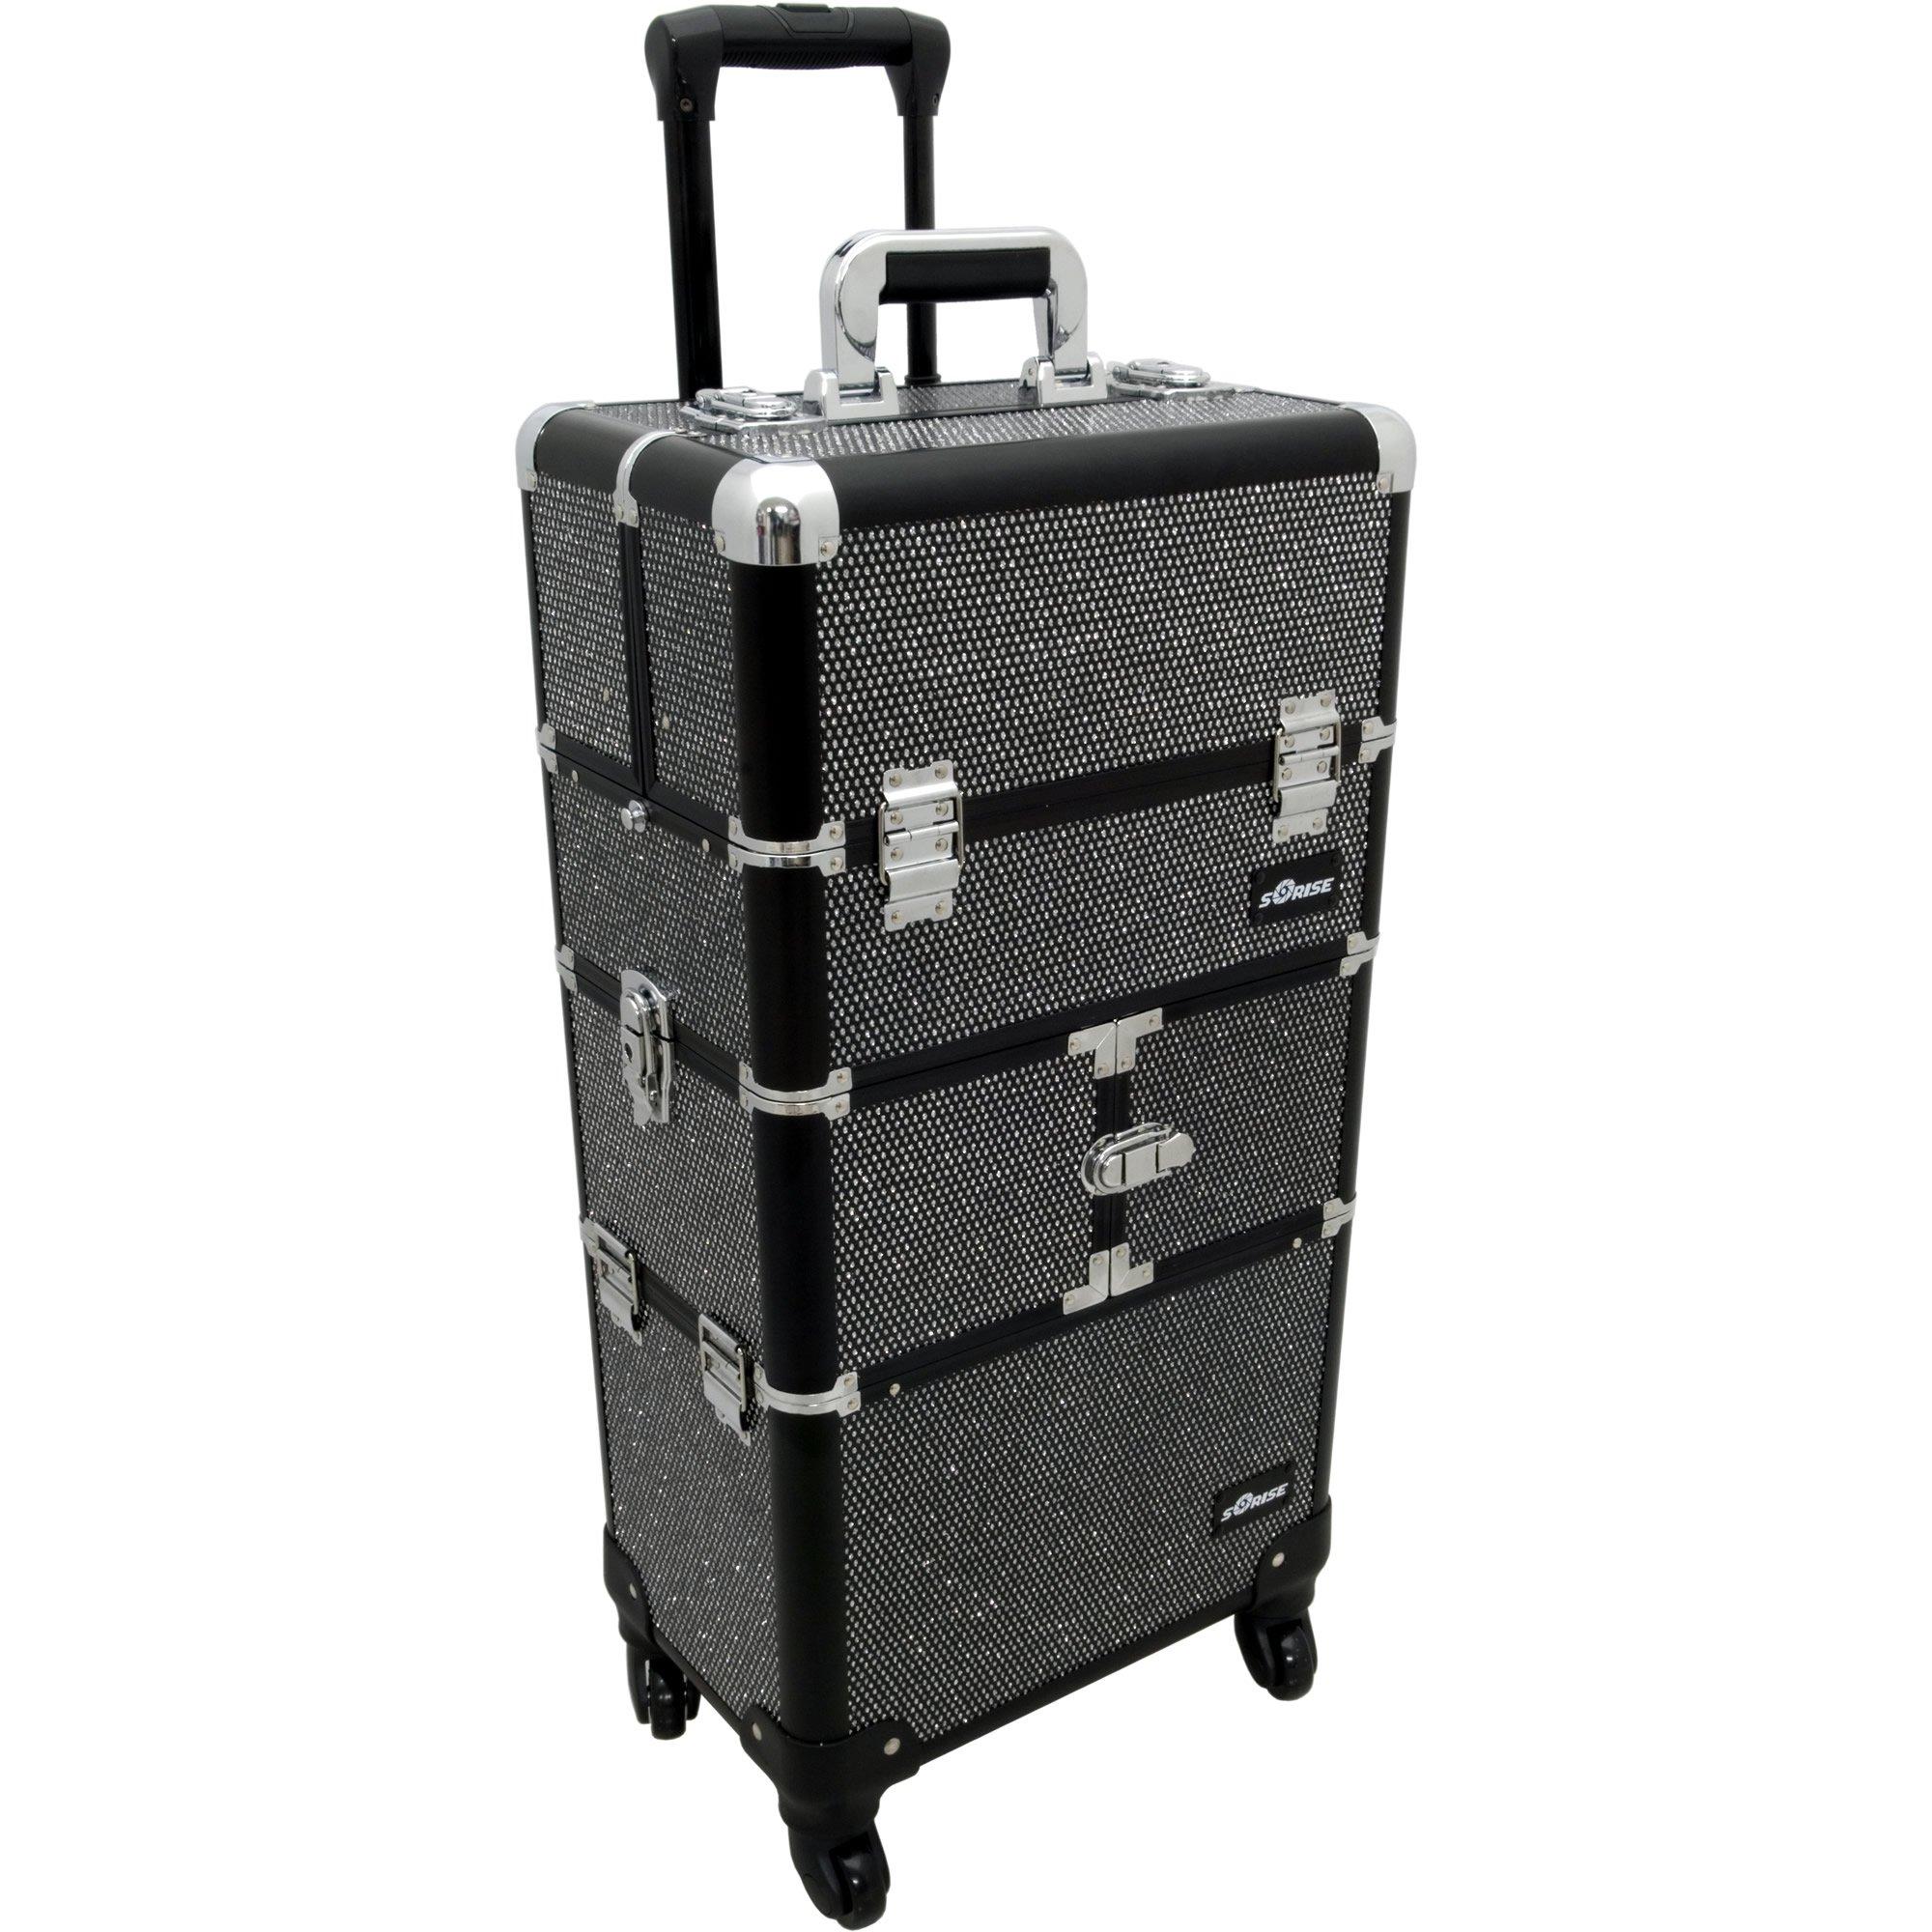 Sunrise De Mezo 2-In-1 Rolling Makeup Case Professional Nail Travel Organizer Box, Black Krystal, 24 Pound by SunRise